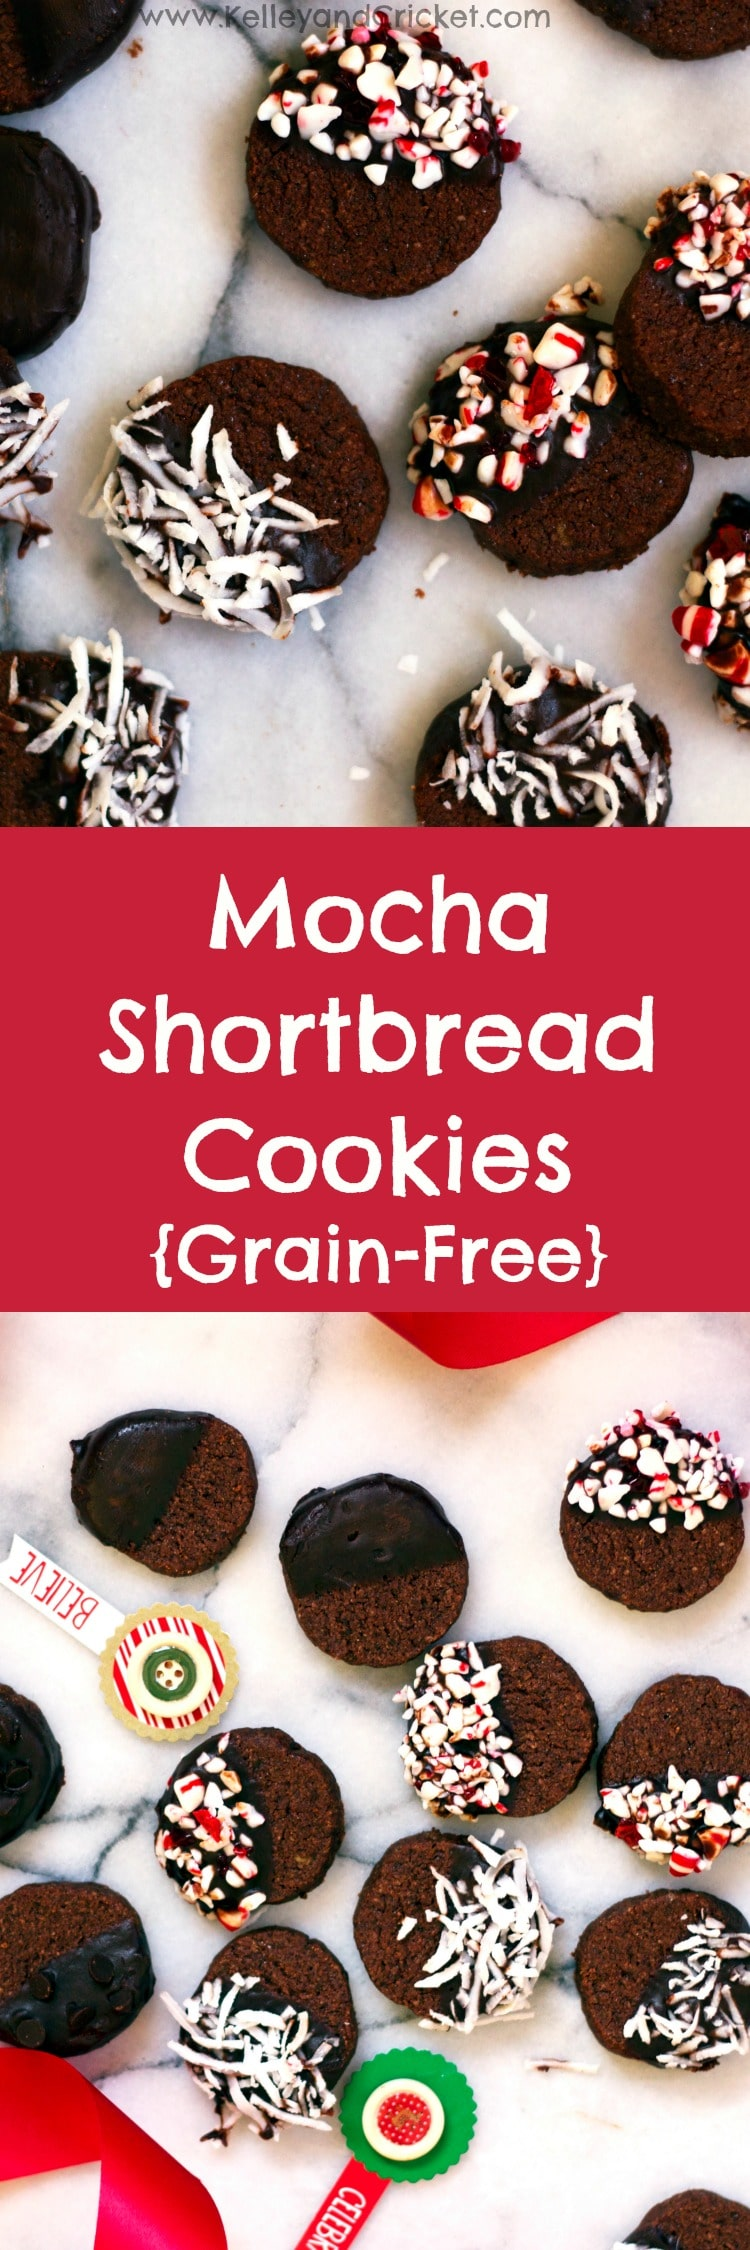 Mocha Shortbread {Grain-Free, Gluten-Free, Paleo} - Kelley and Cricket